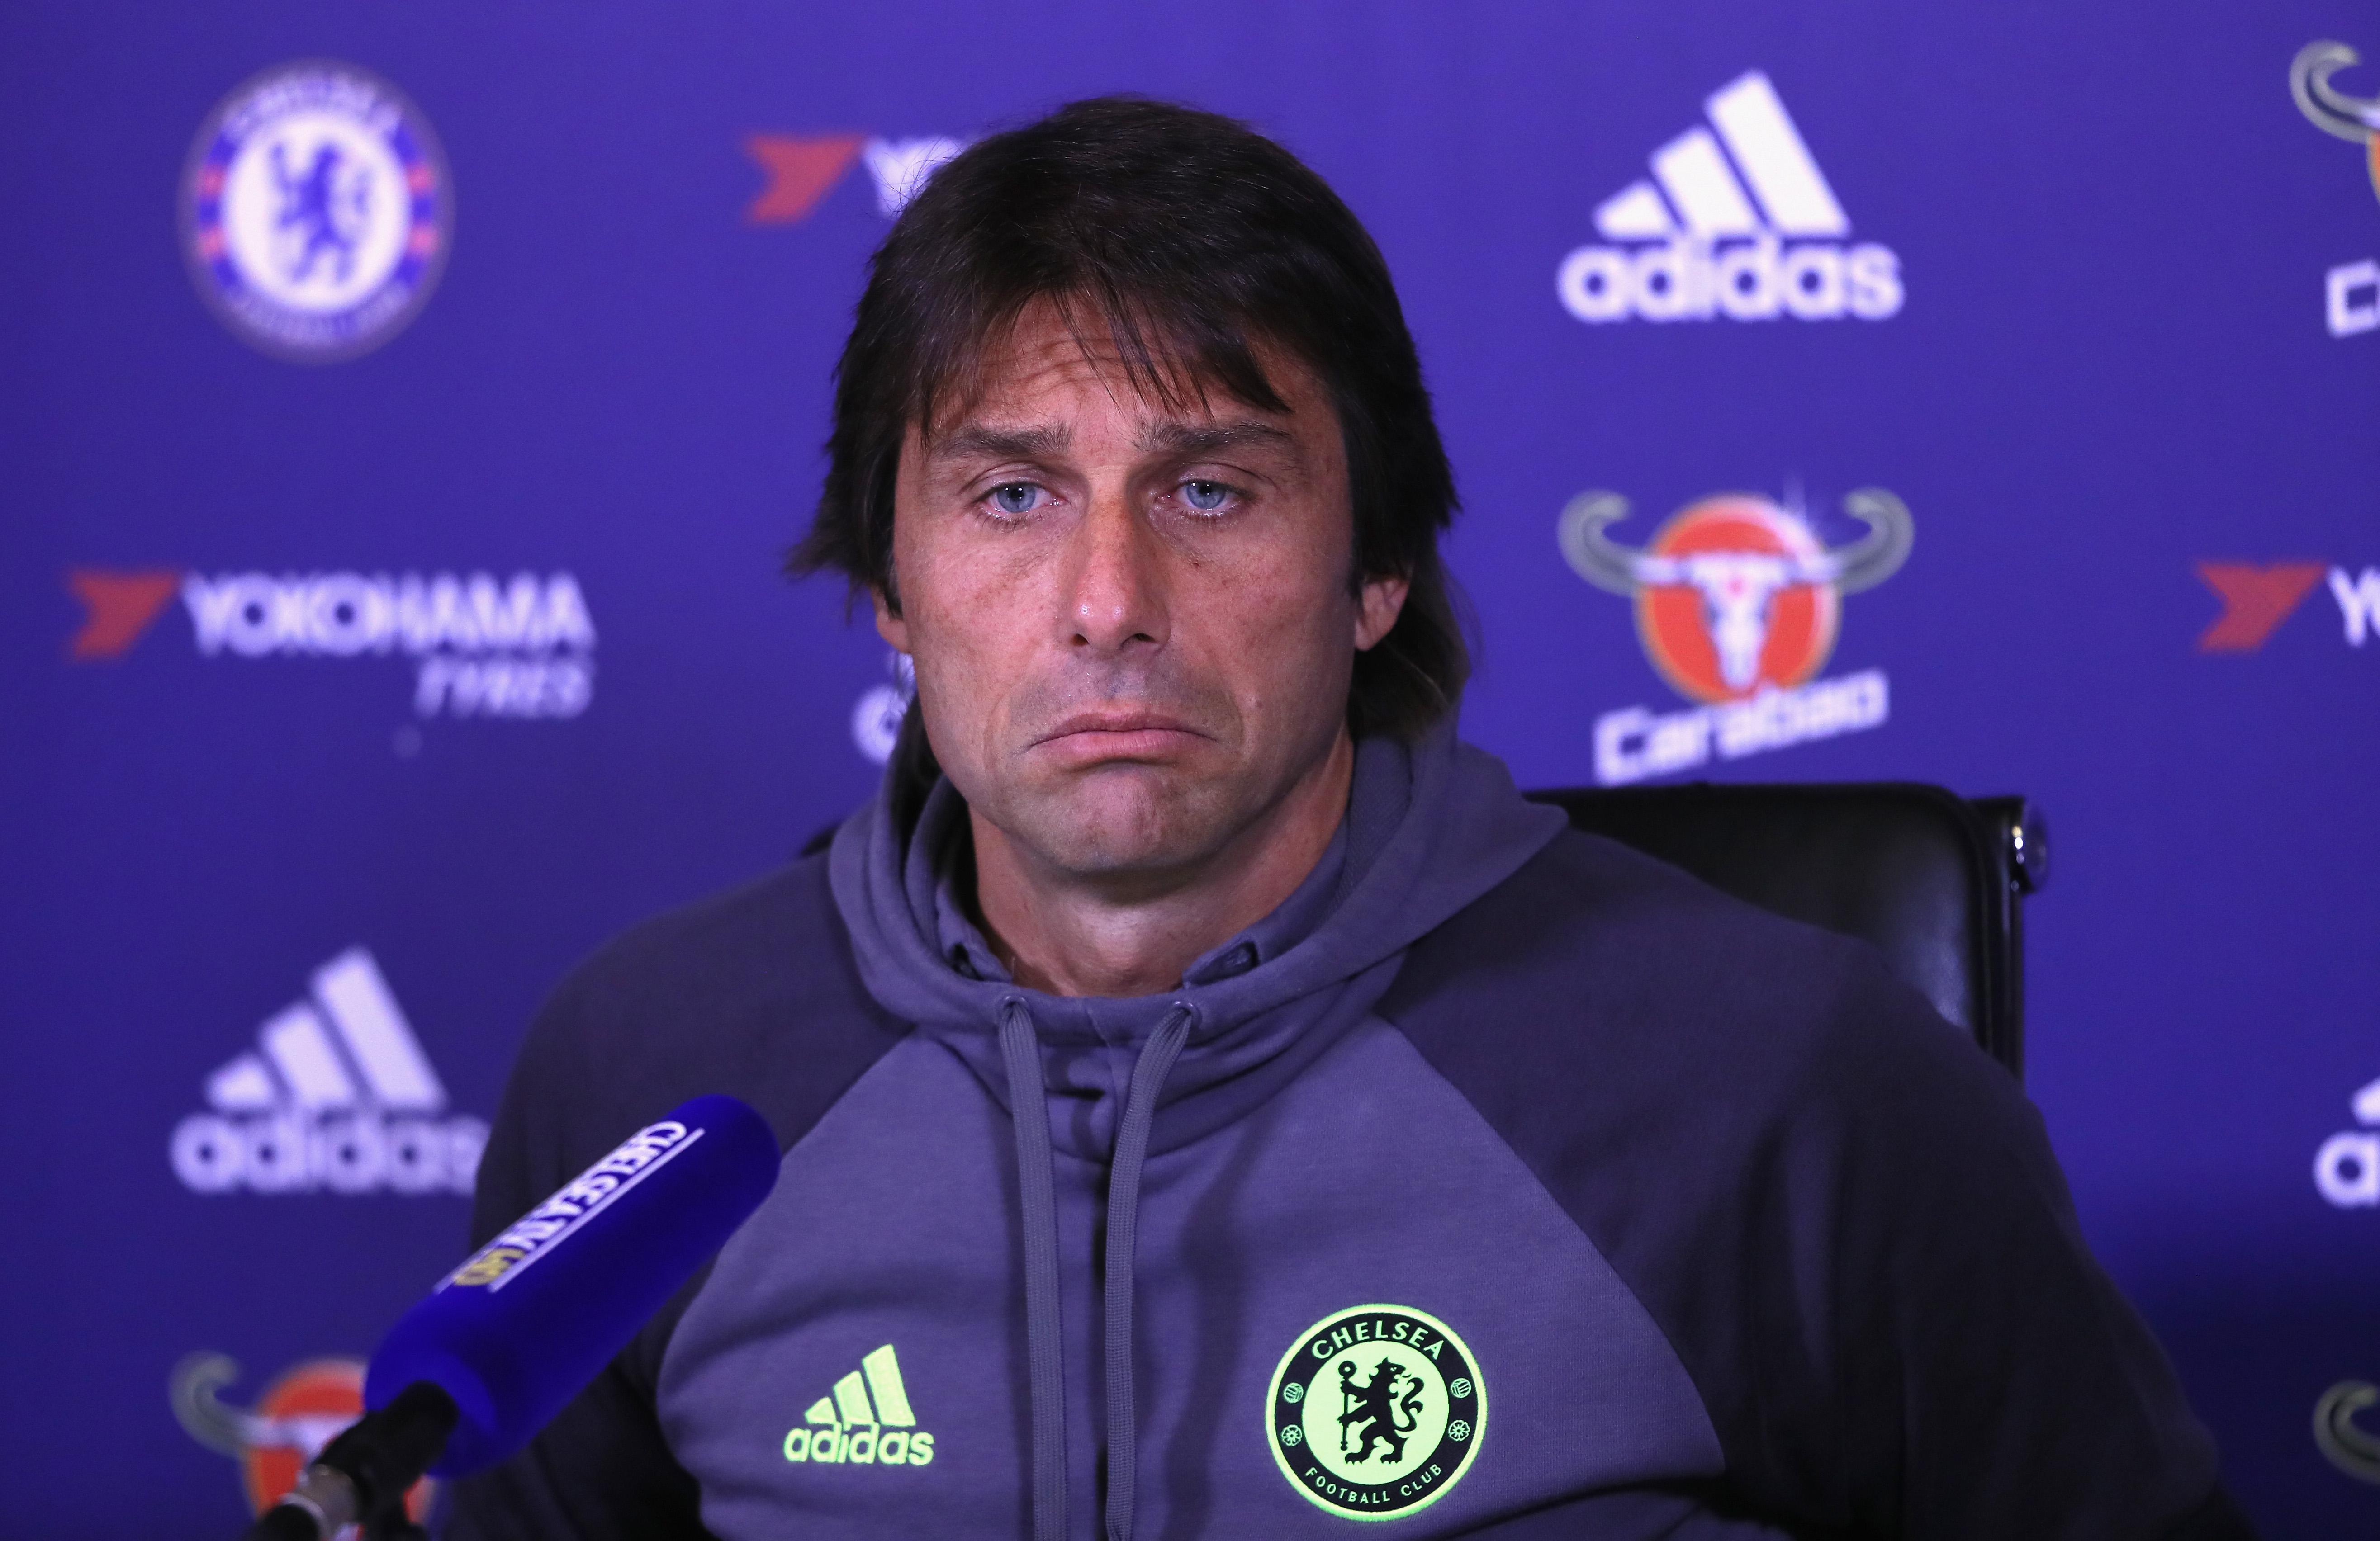 Italy head coach Giampiero Ventura takes swipe at Chelsea boss Antonio Conte